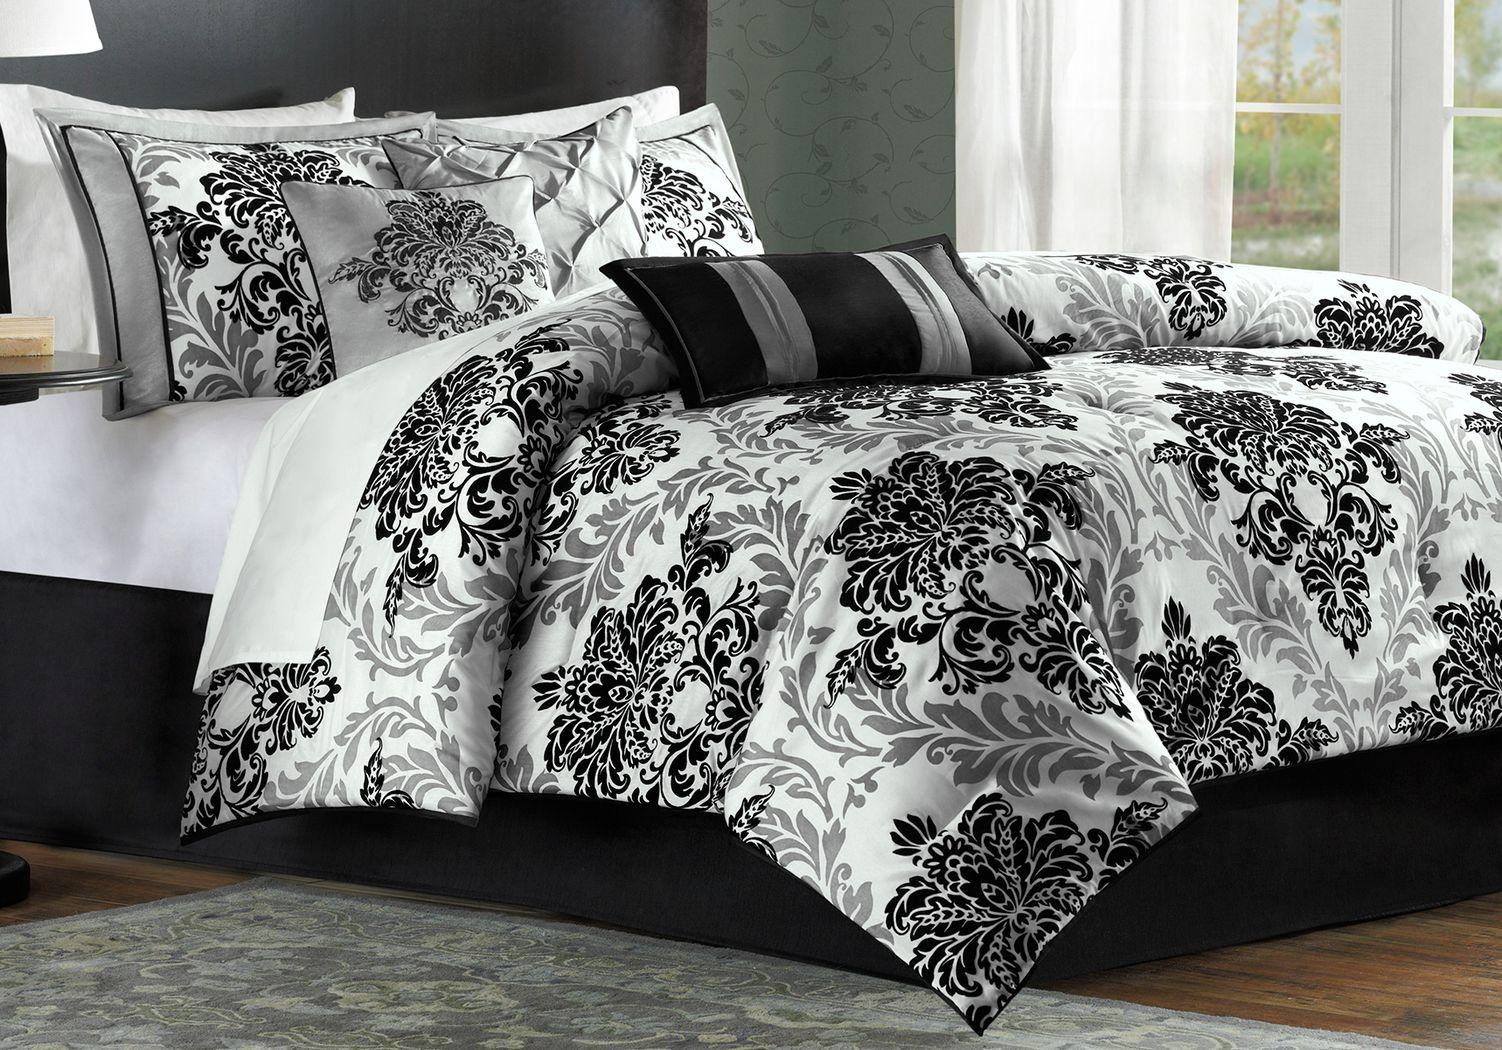 Bellaire Gray 7 Pc King Comforter Set